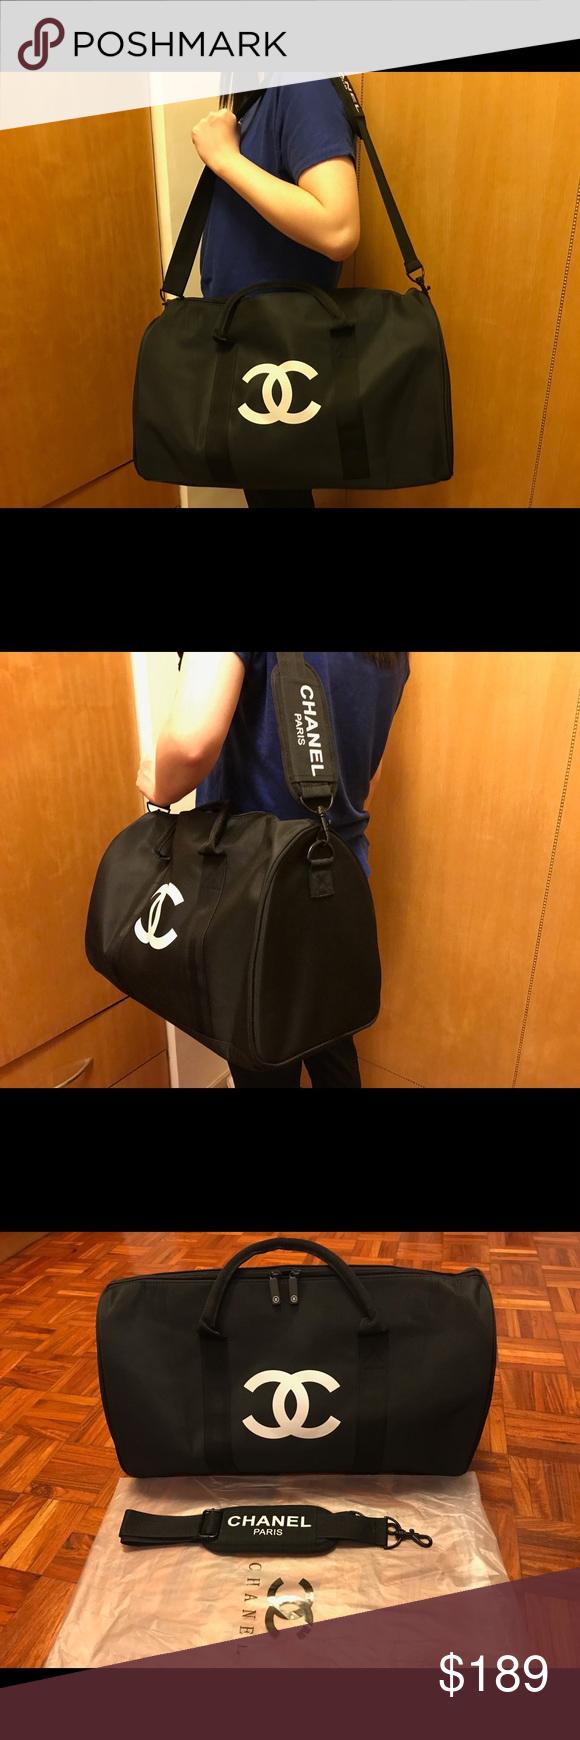 98d10b59c4e2 Chanel VIP gift bag cross body bag travel bag Authentic 2017 Chanel VIP  gift bag cross